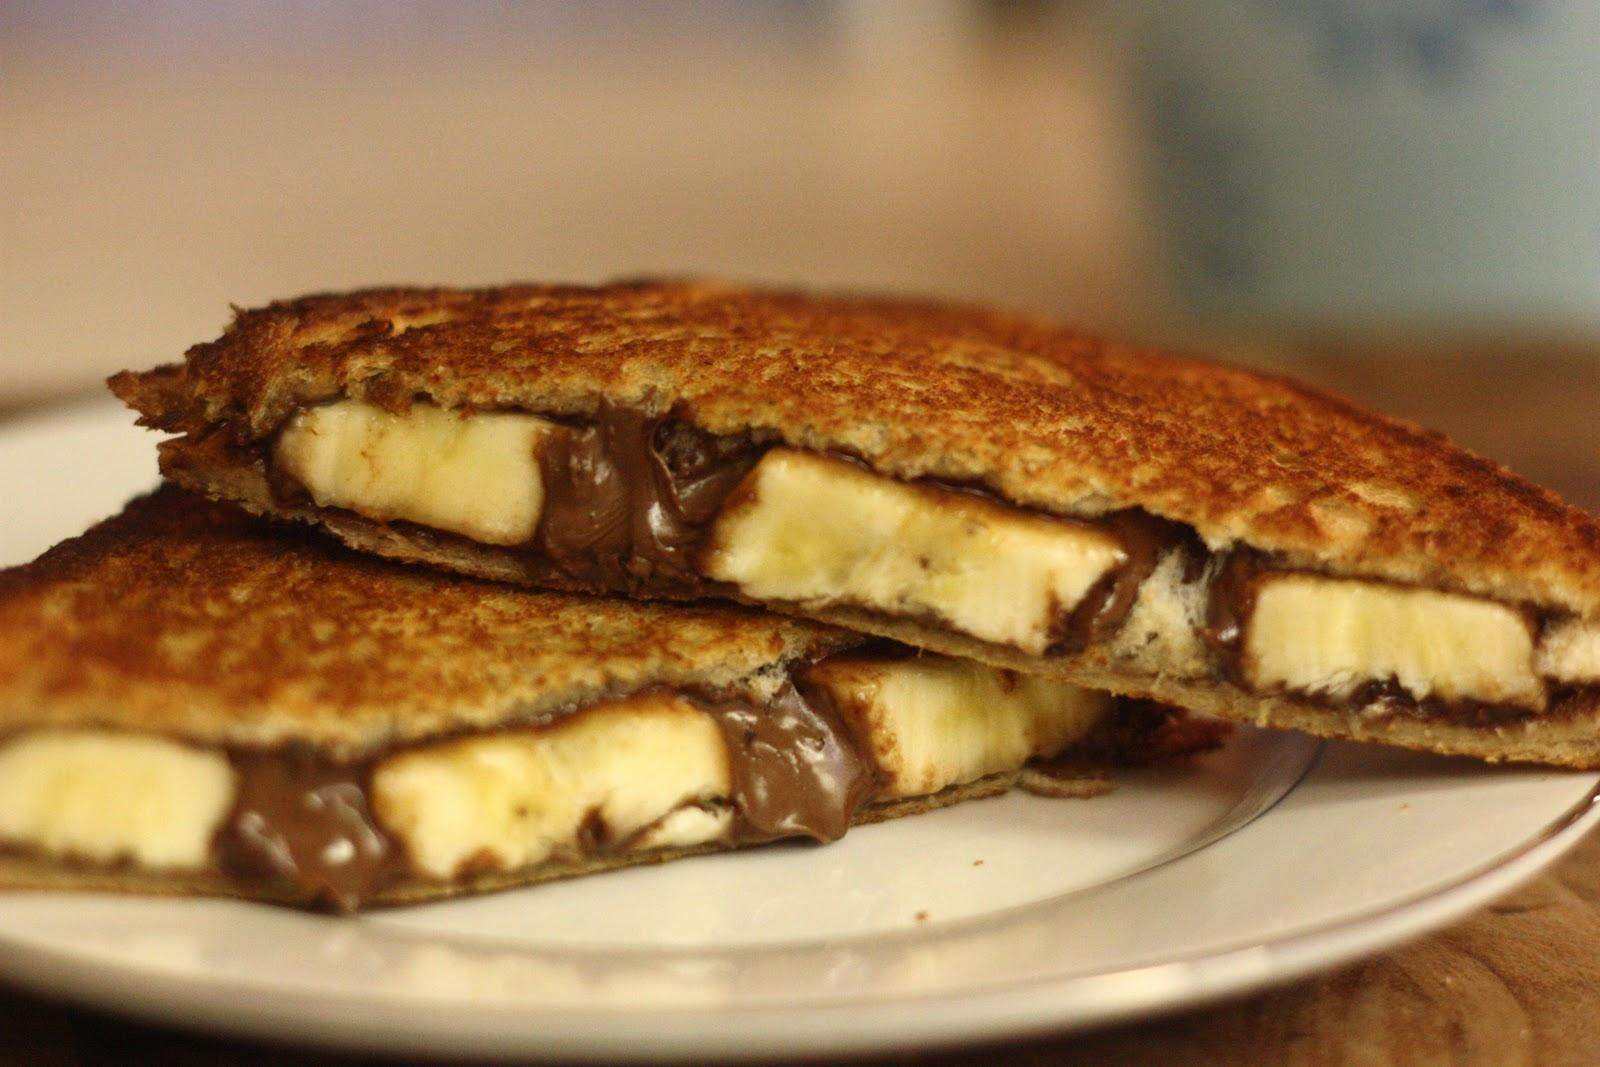 pudding nutella banana marshmallow creme panino roasted banana nutella ...